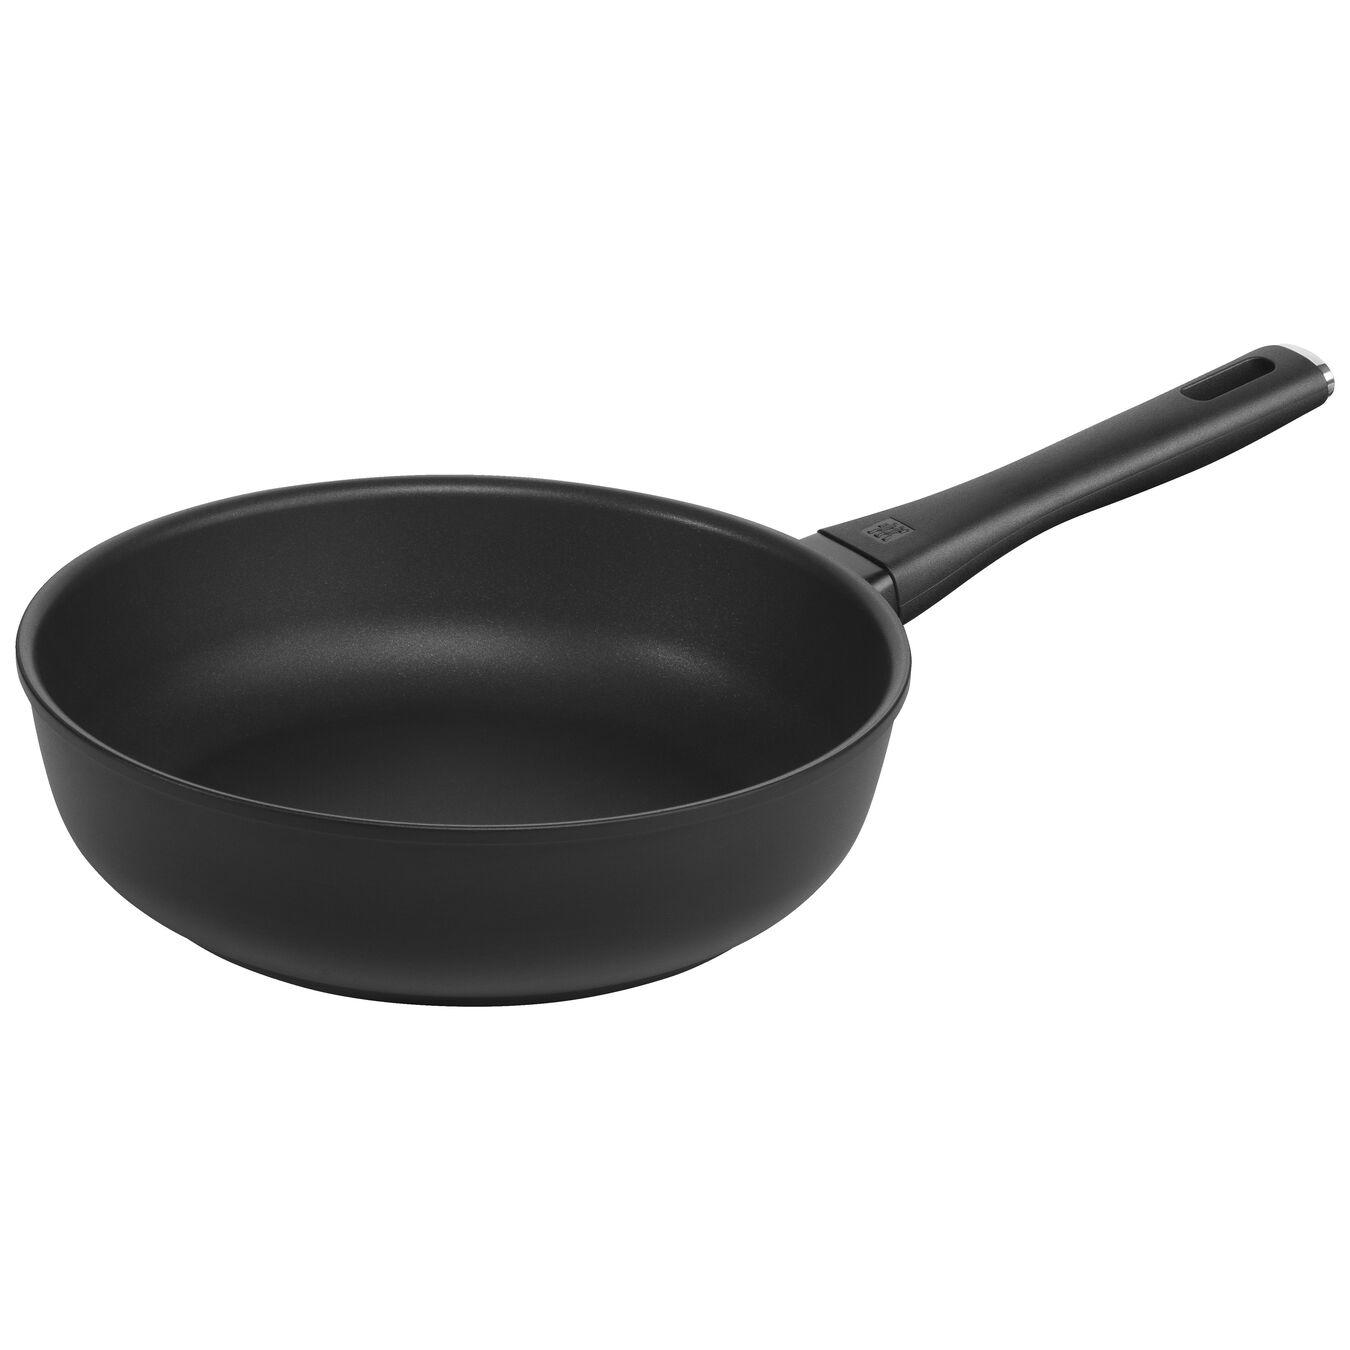 Nonstick 2-pc Deep Fry Pan Set,,large 2